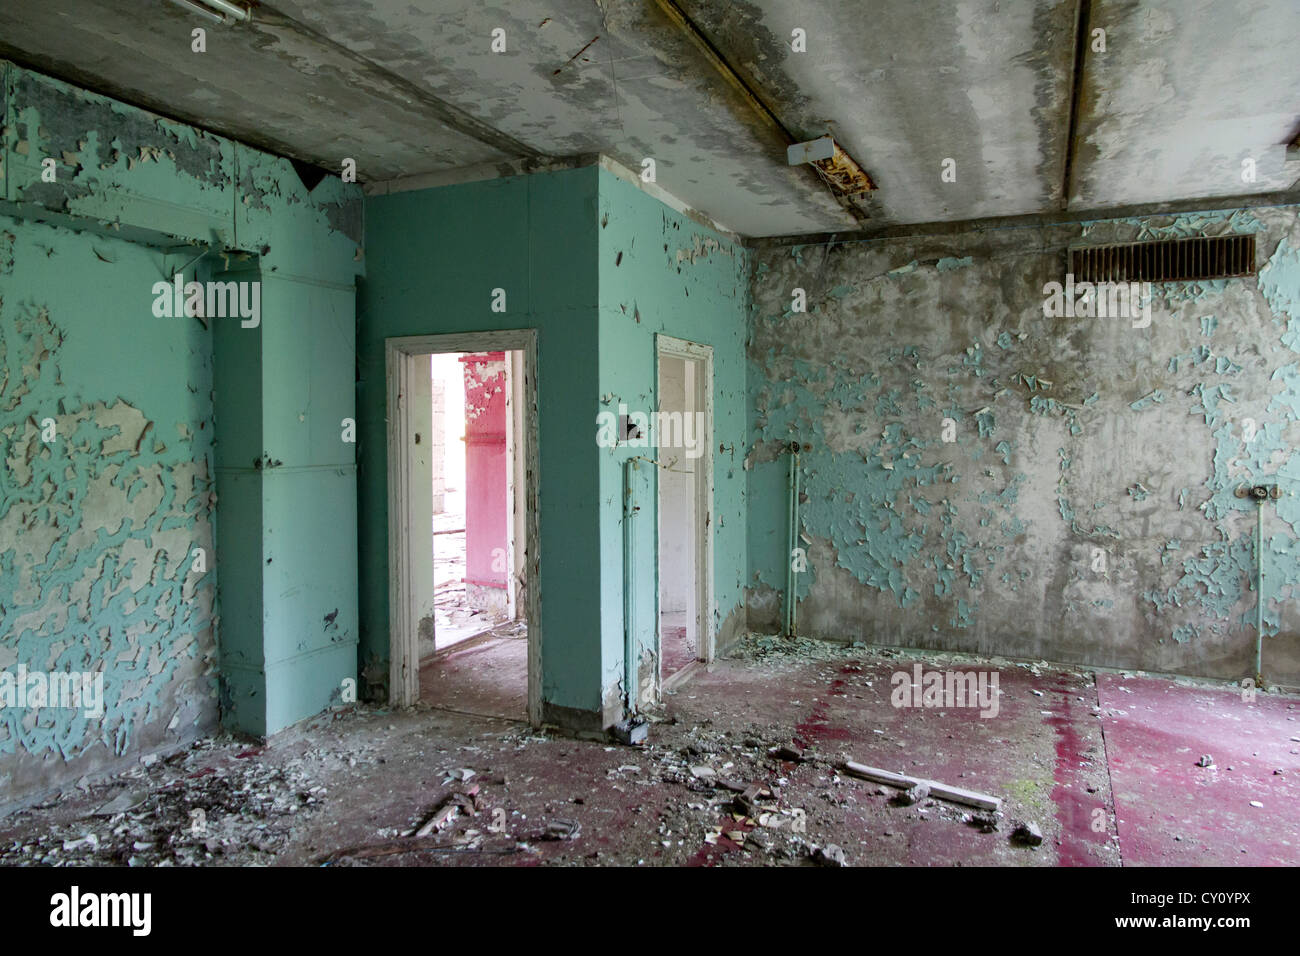 Hotel, Pripyat, Chernobyl Exclusion Zone - Stock Image